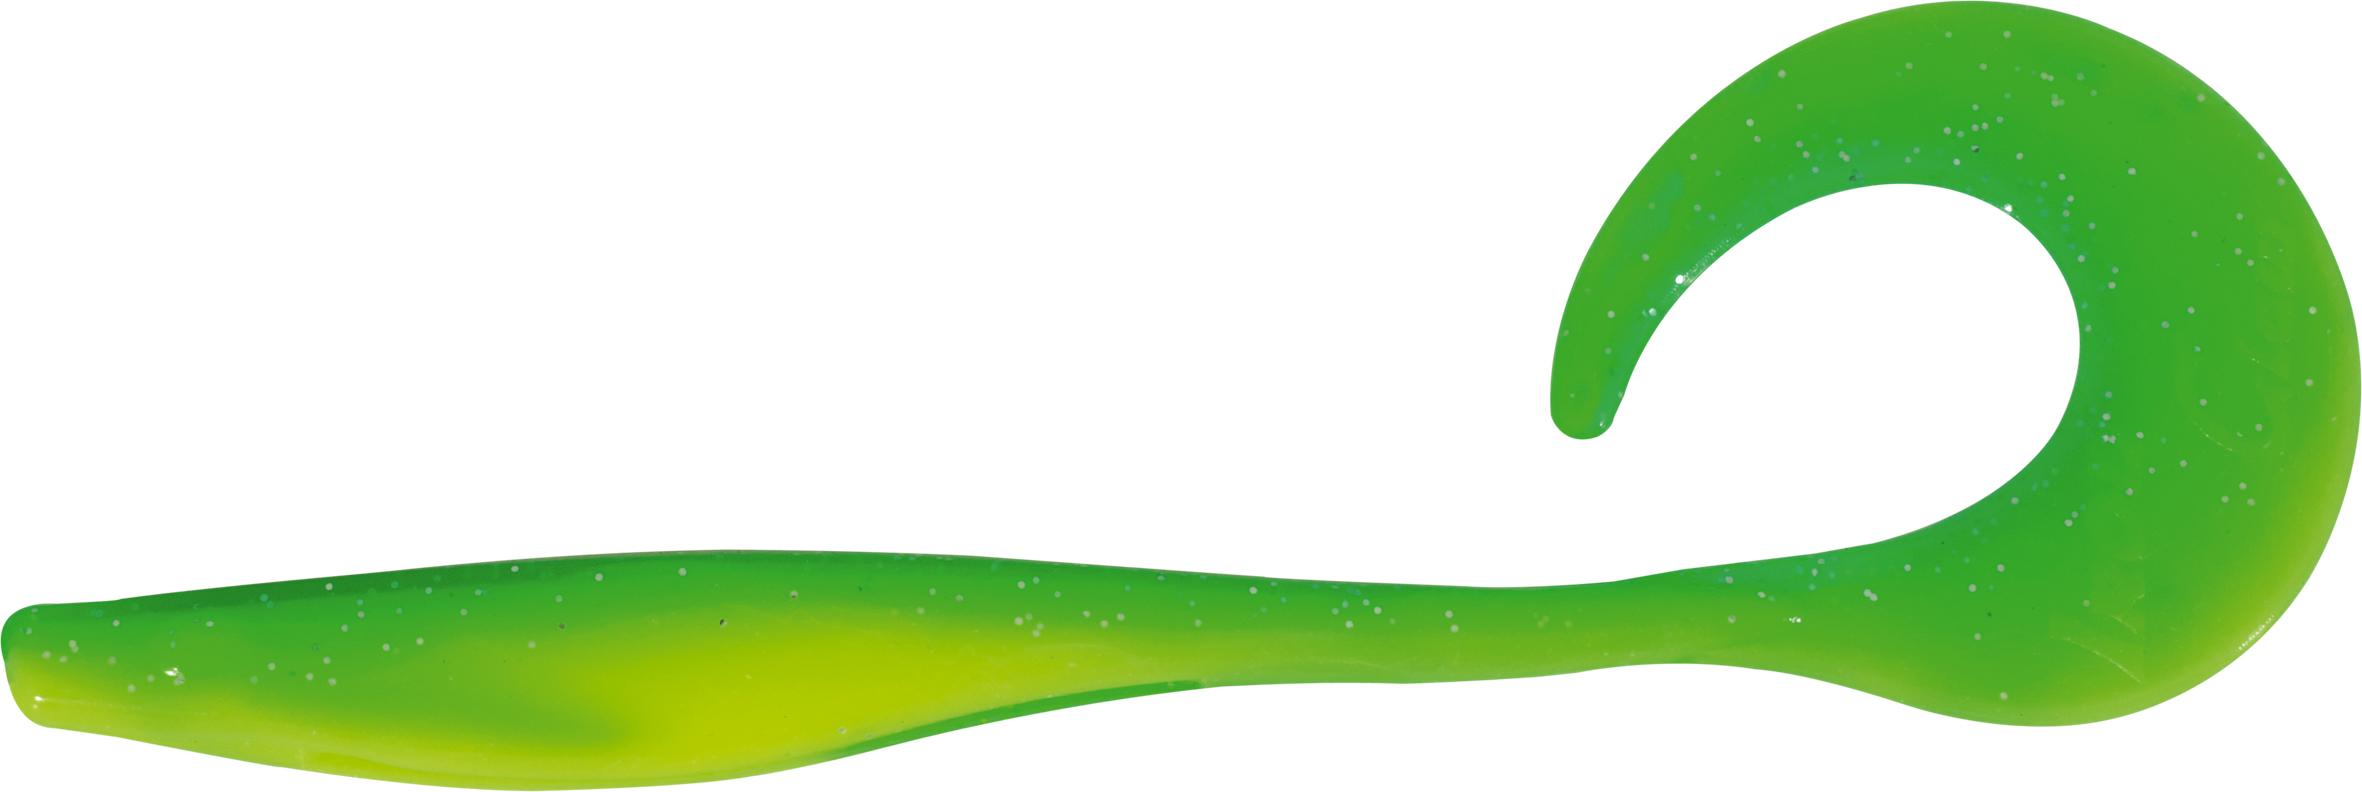 Iron Claw gumová nástraha Slim Jane 13,5 cm Vzor CG, 3ks